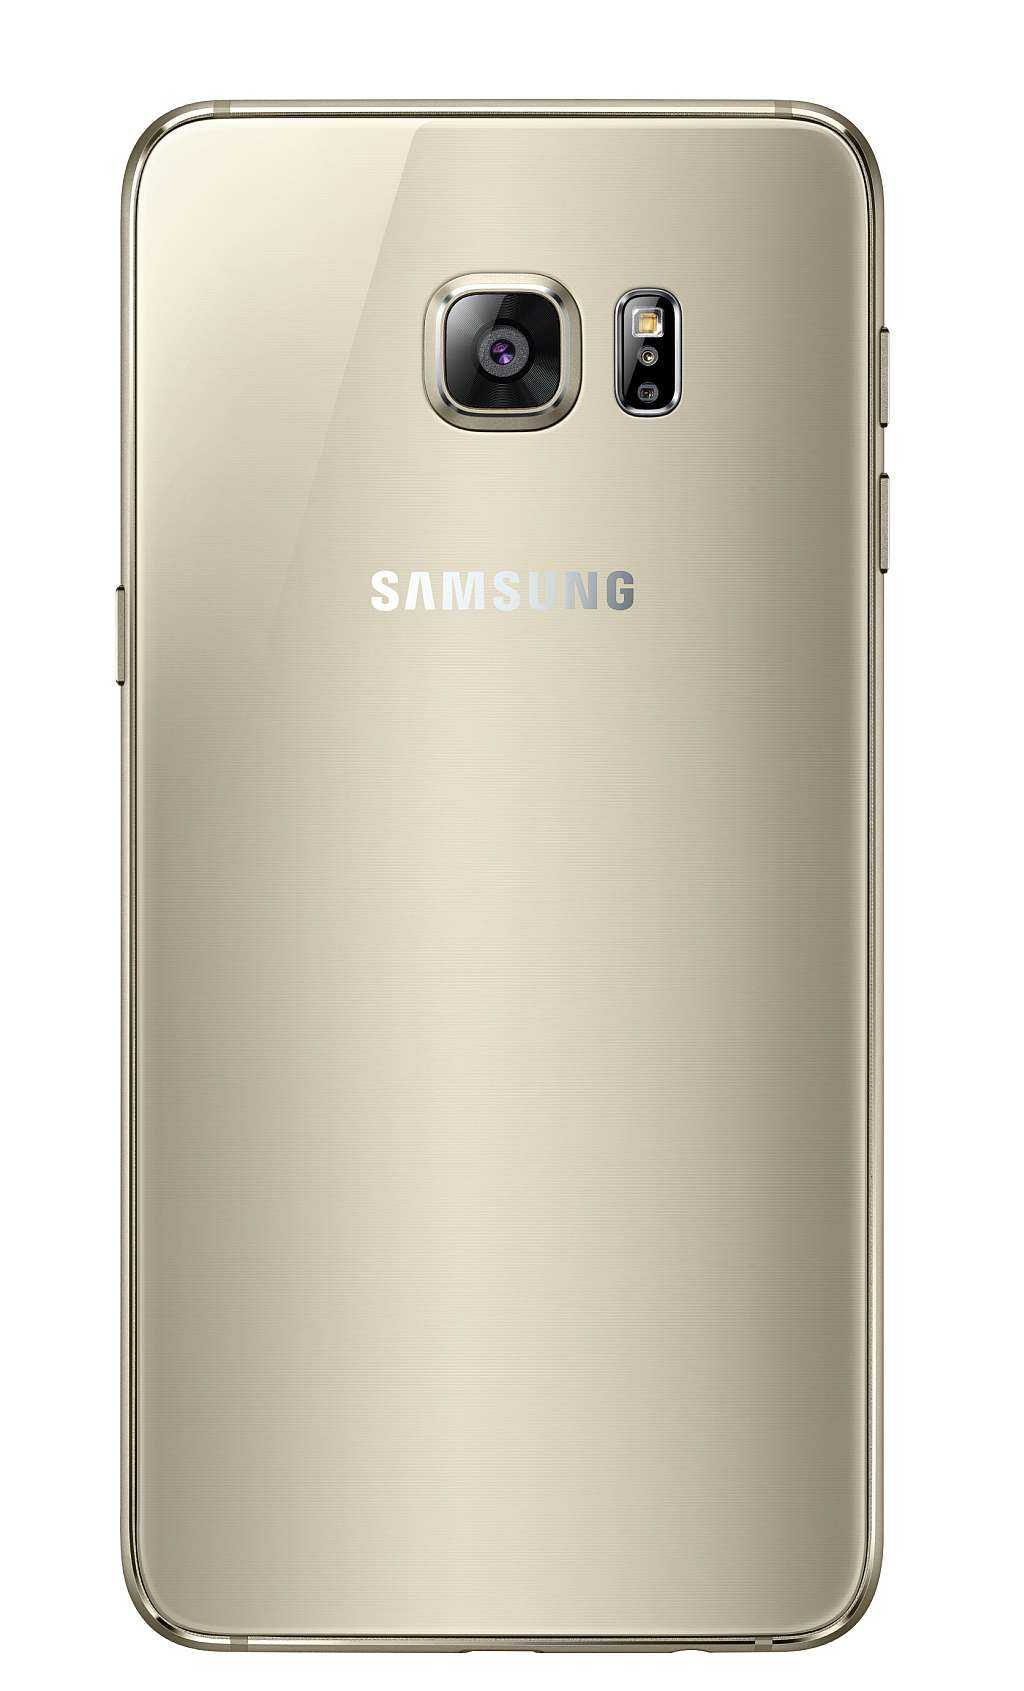 Samsung Galaxy S6 edge plus spate